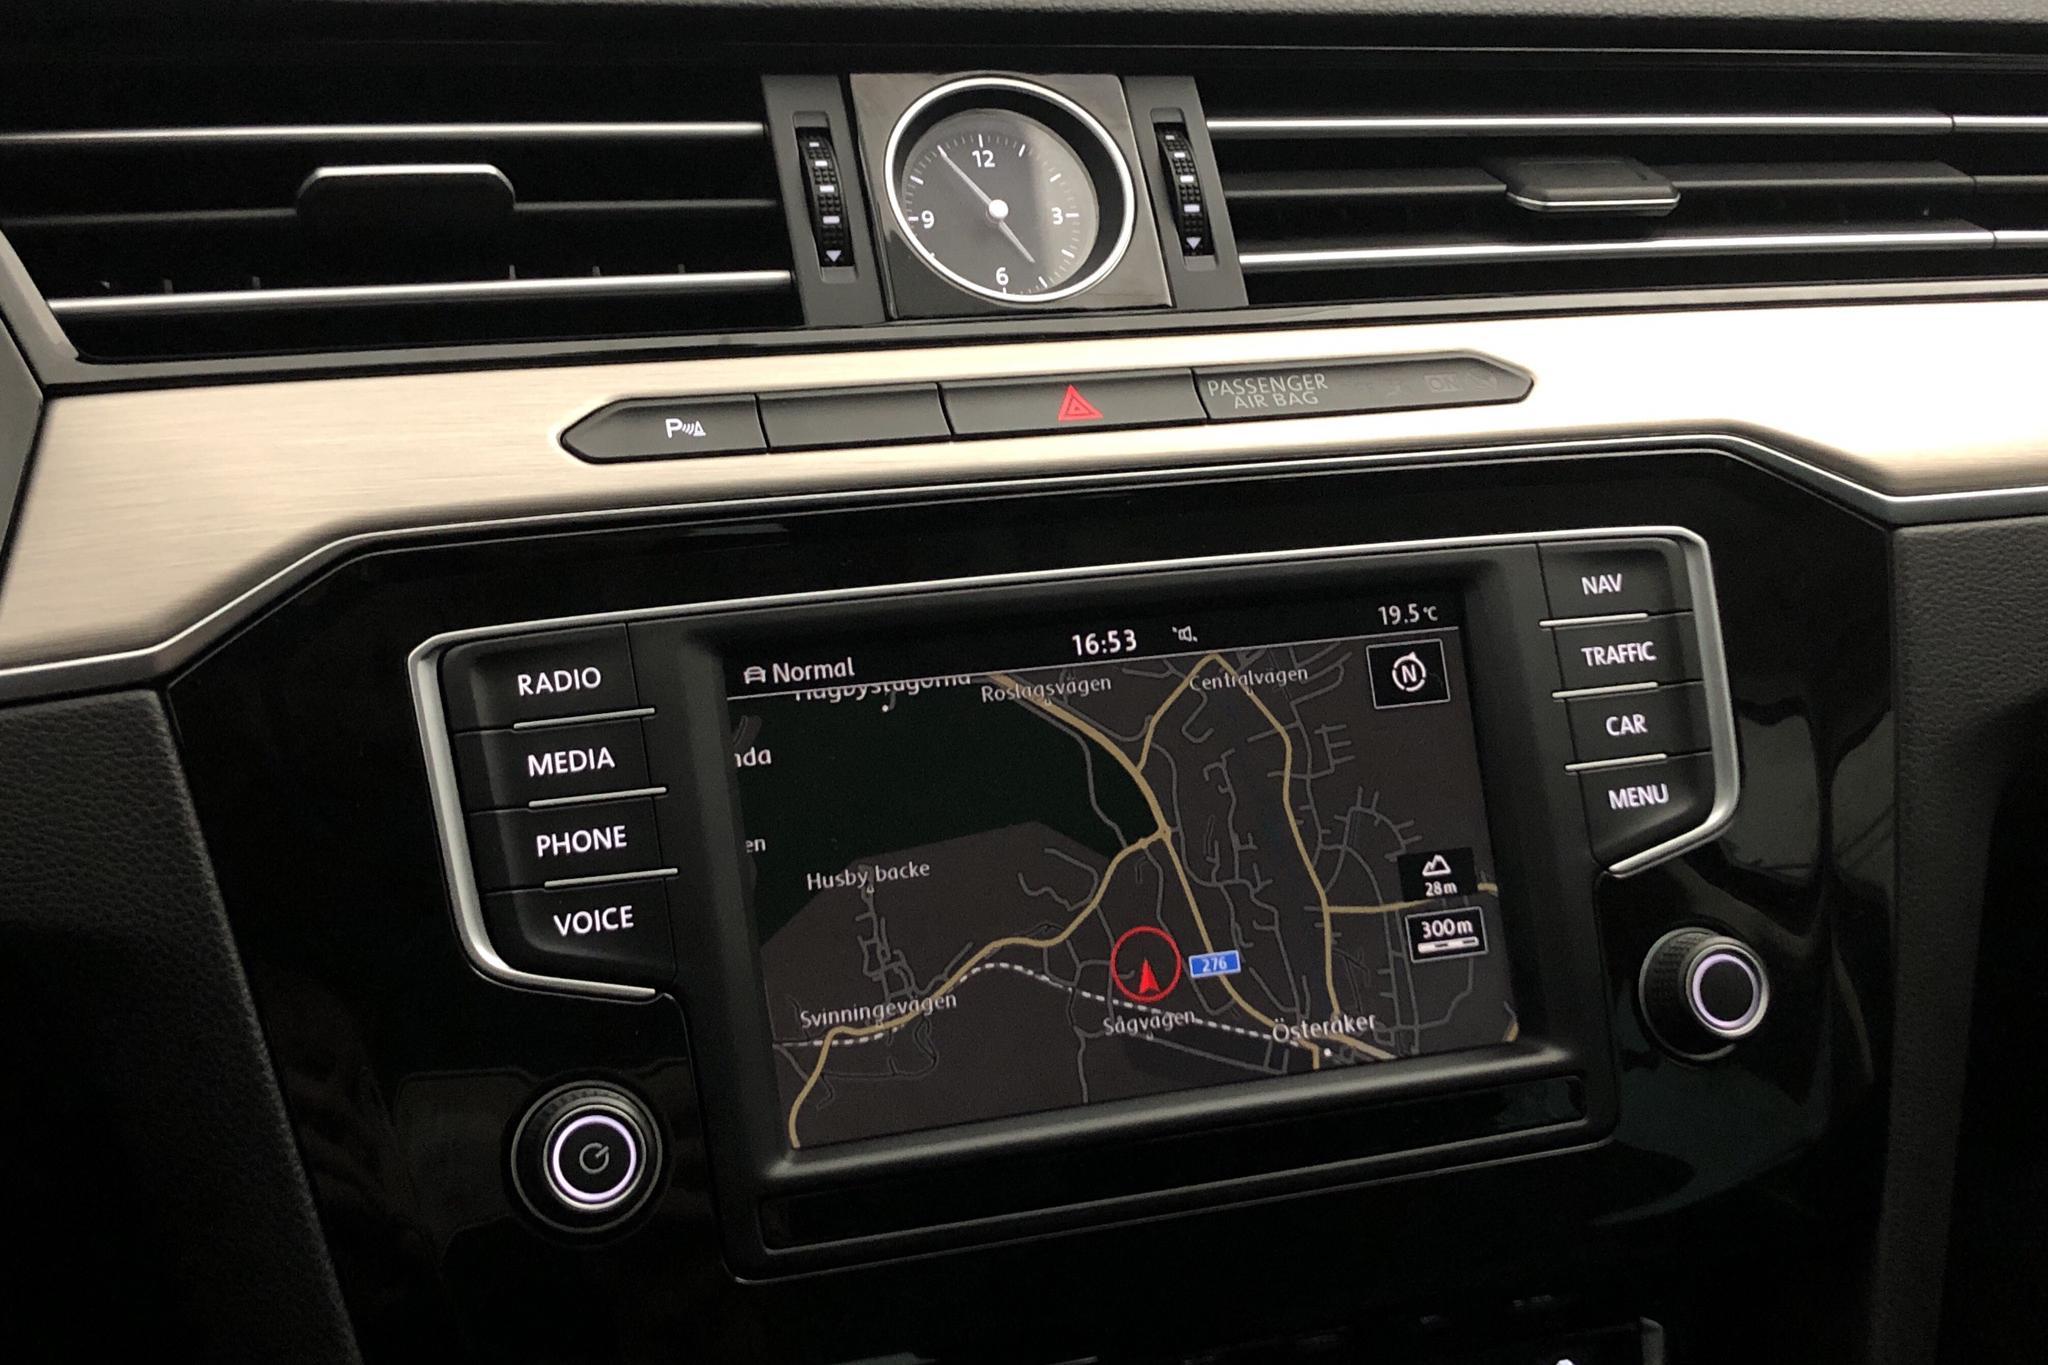 VW Passat 2.0 TDI Sportscombi 4MOTION (190hk) - 9 068 mil - Automat - Dark Blue - 2016